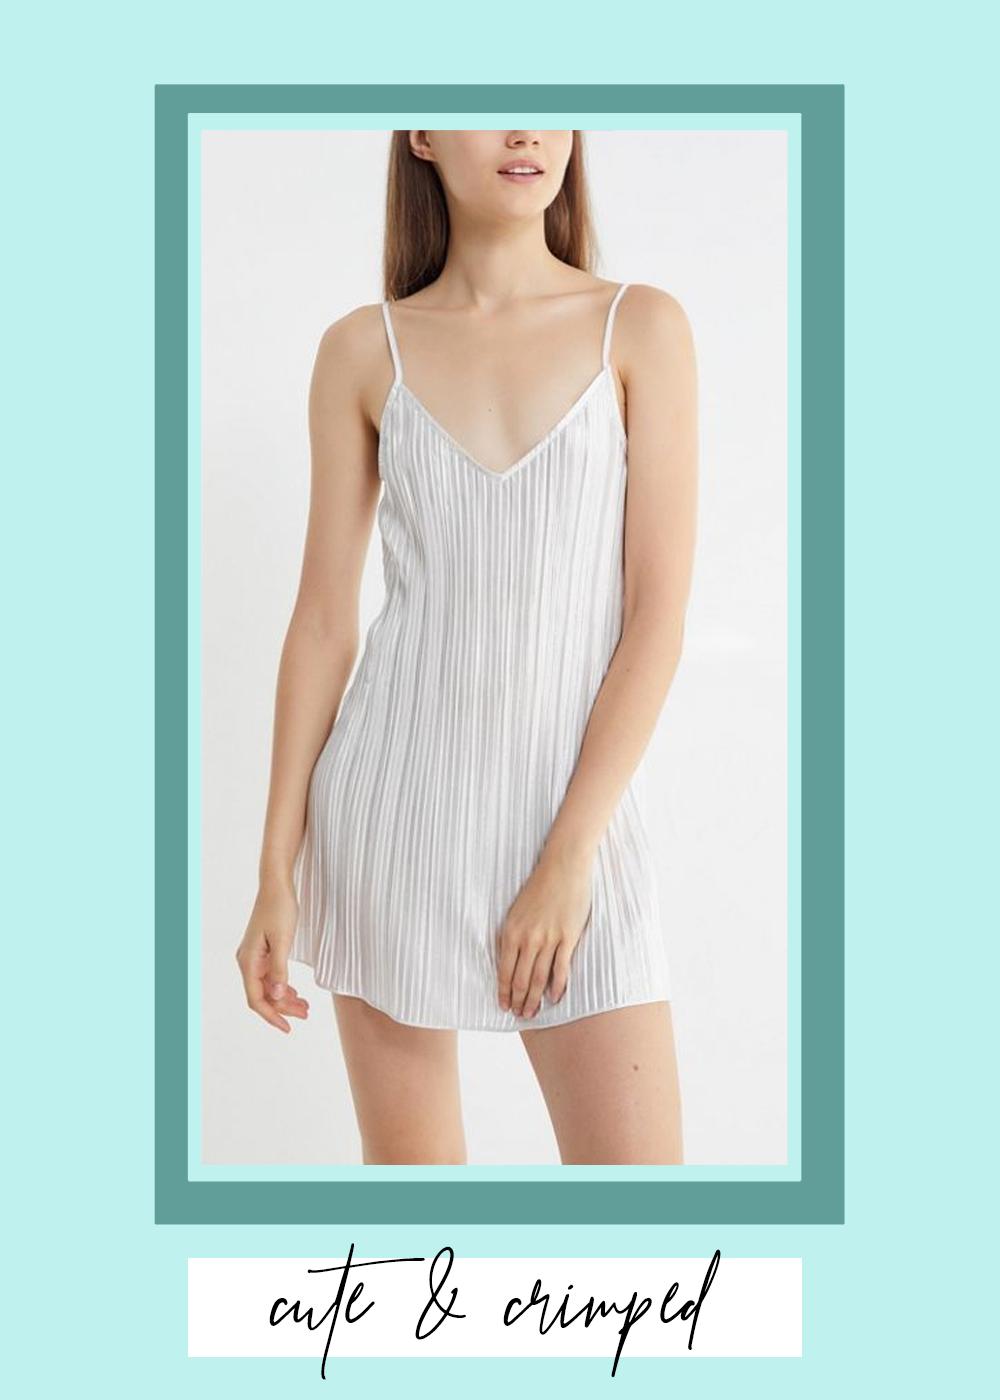 002. - UO Metallic Pleated Slip Mini DressUrban Outfitters // $59